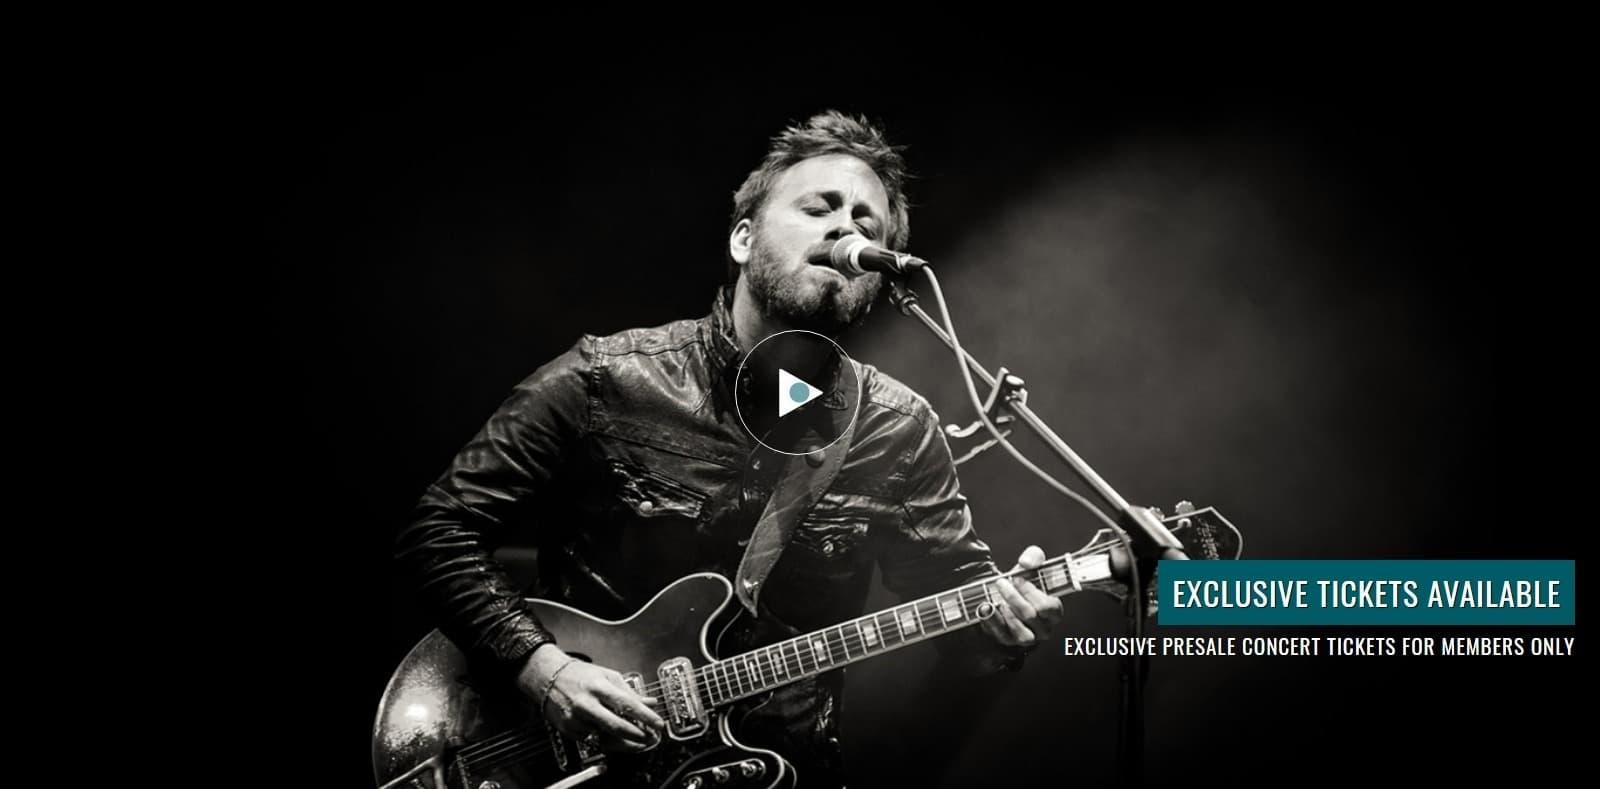 jam-session-html-music-website-template